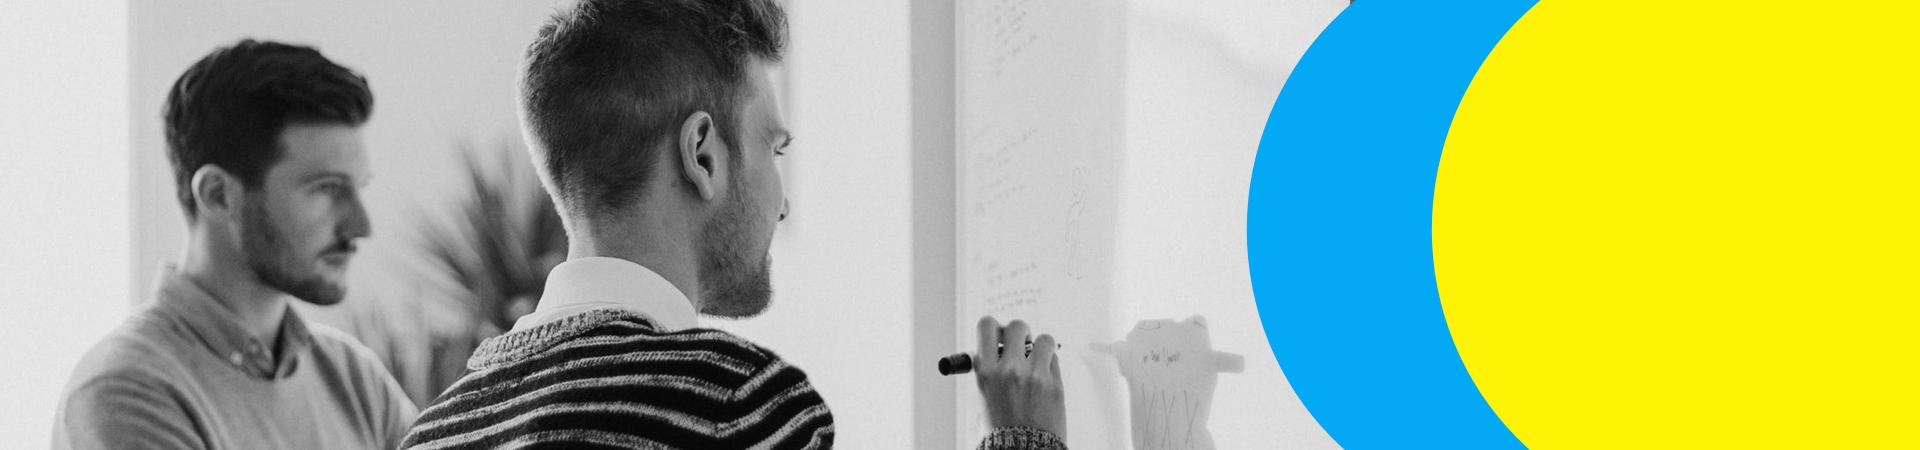 Tivona Global - provides training in AWS, DevOps and Python